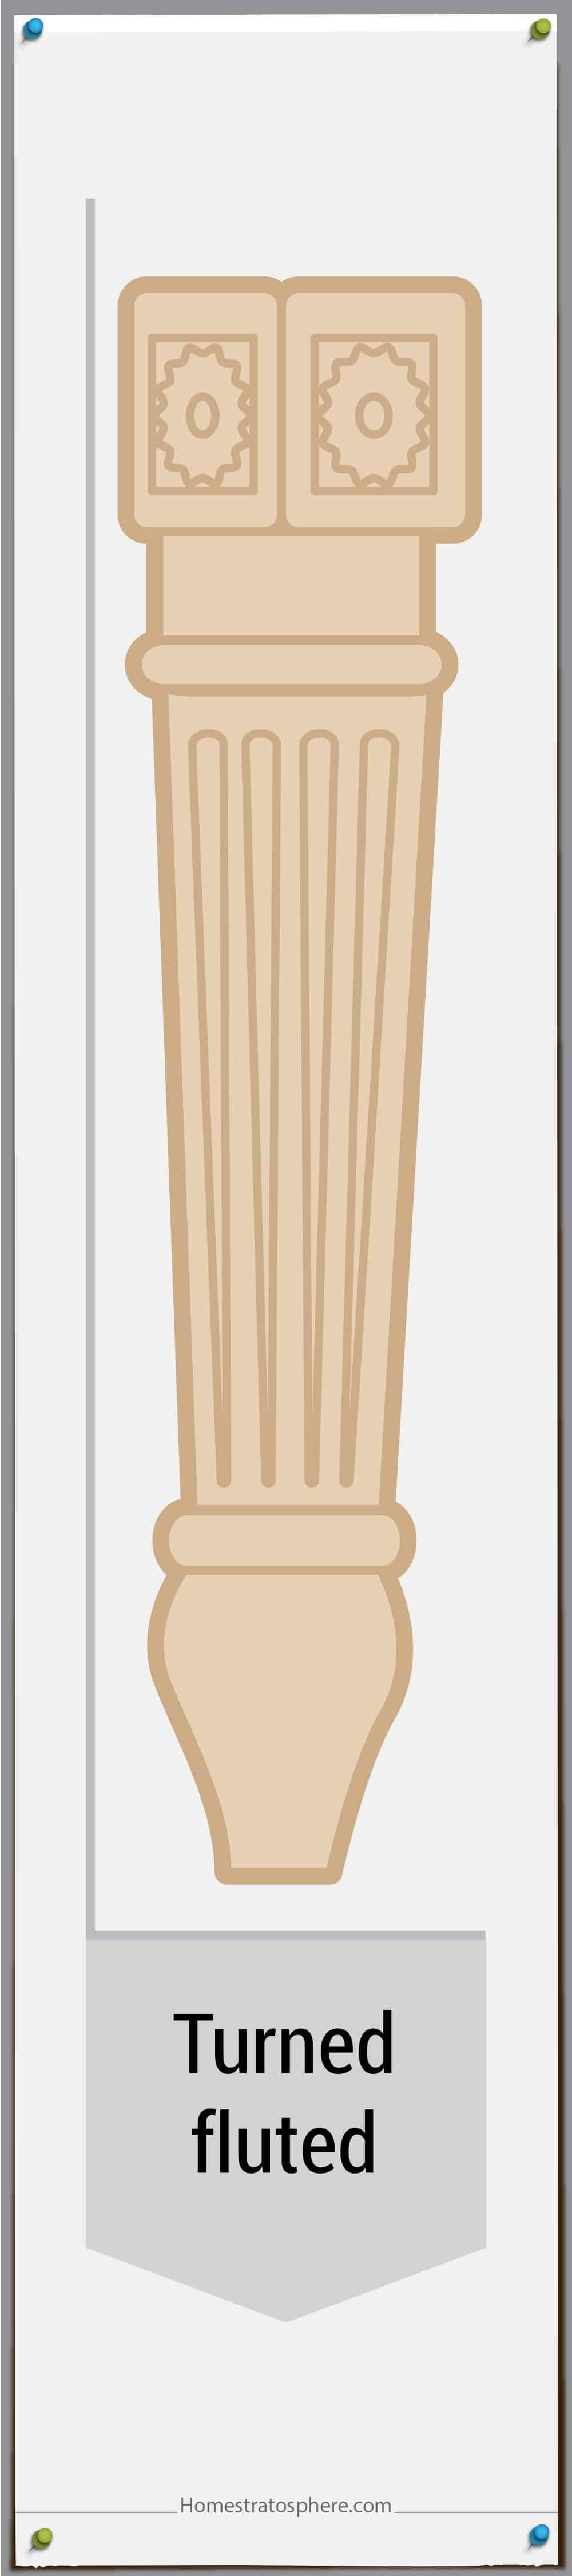 Turned flute leg style